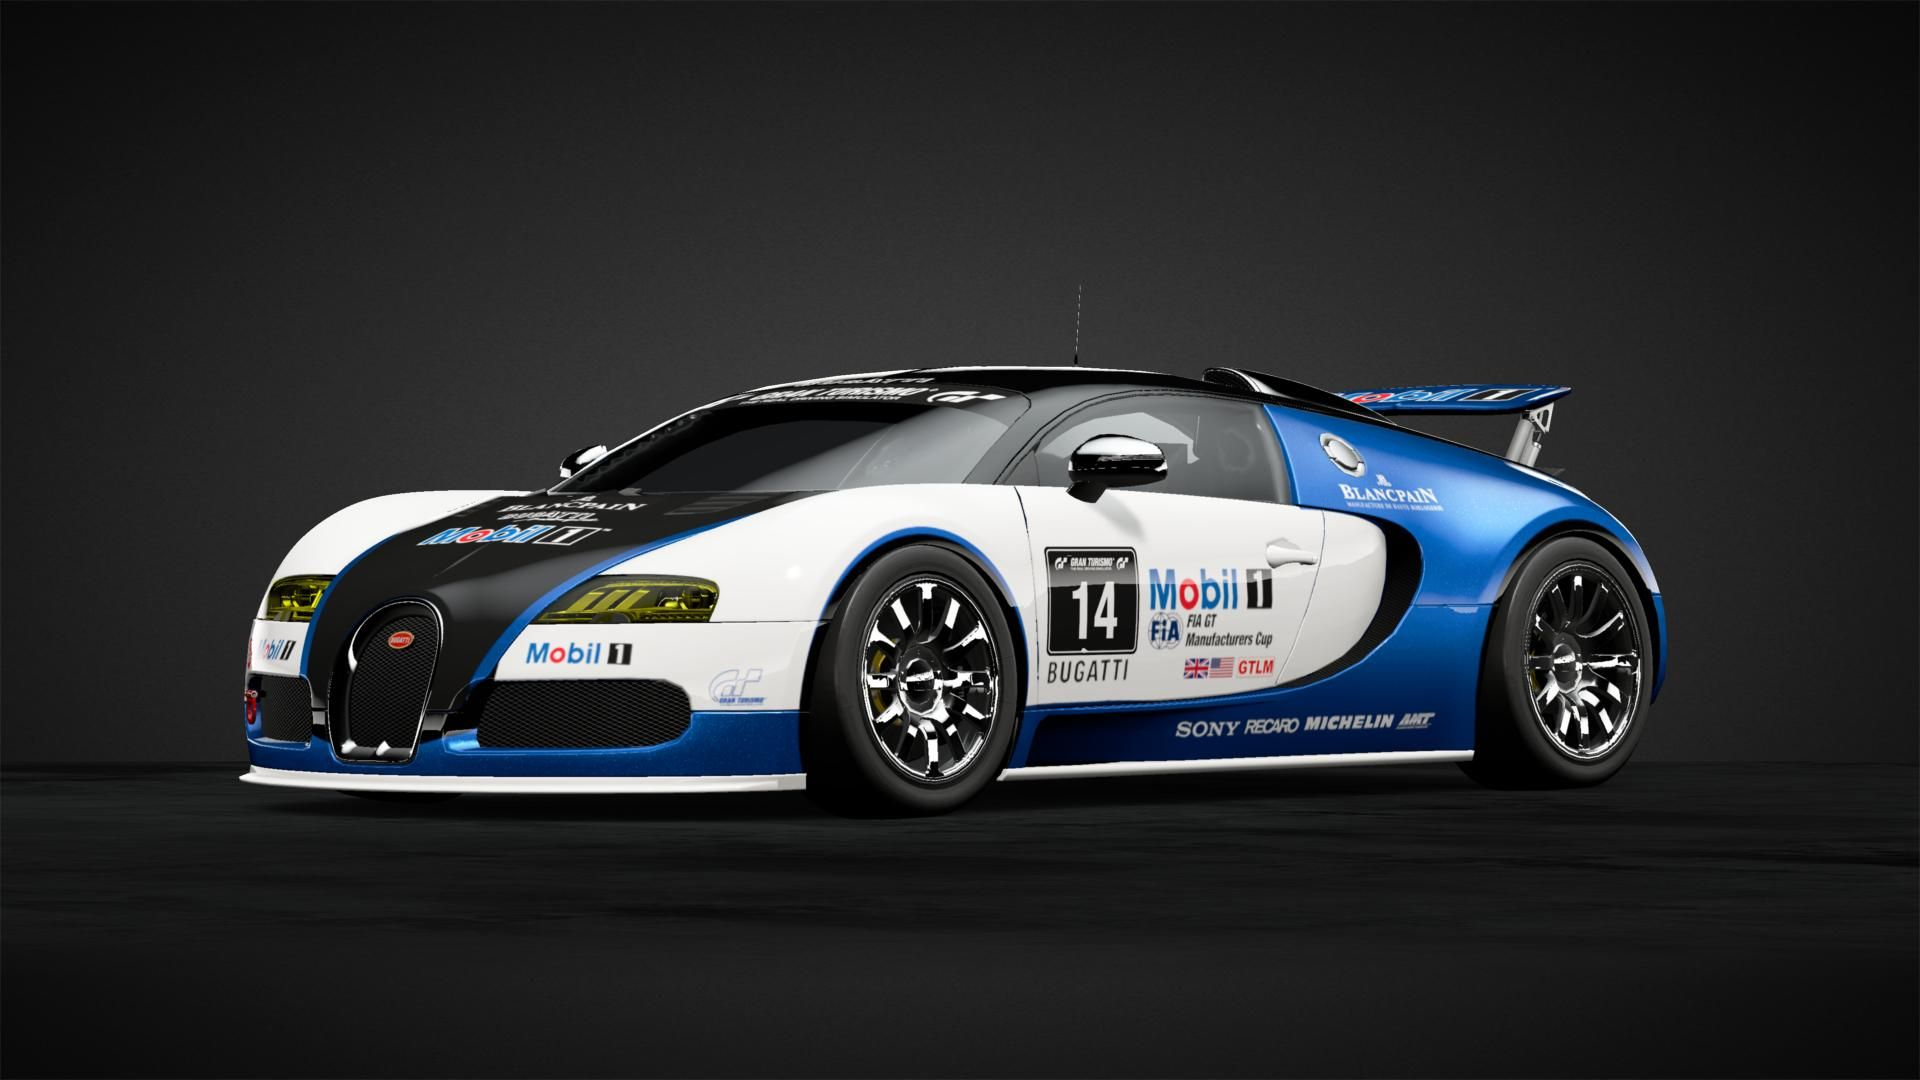 Mobile 1 Bugatti Car Livery by gearmeister Community